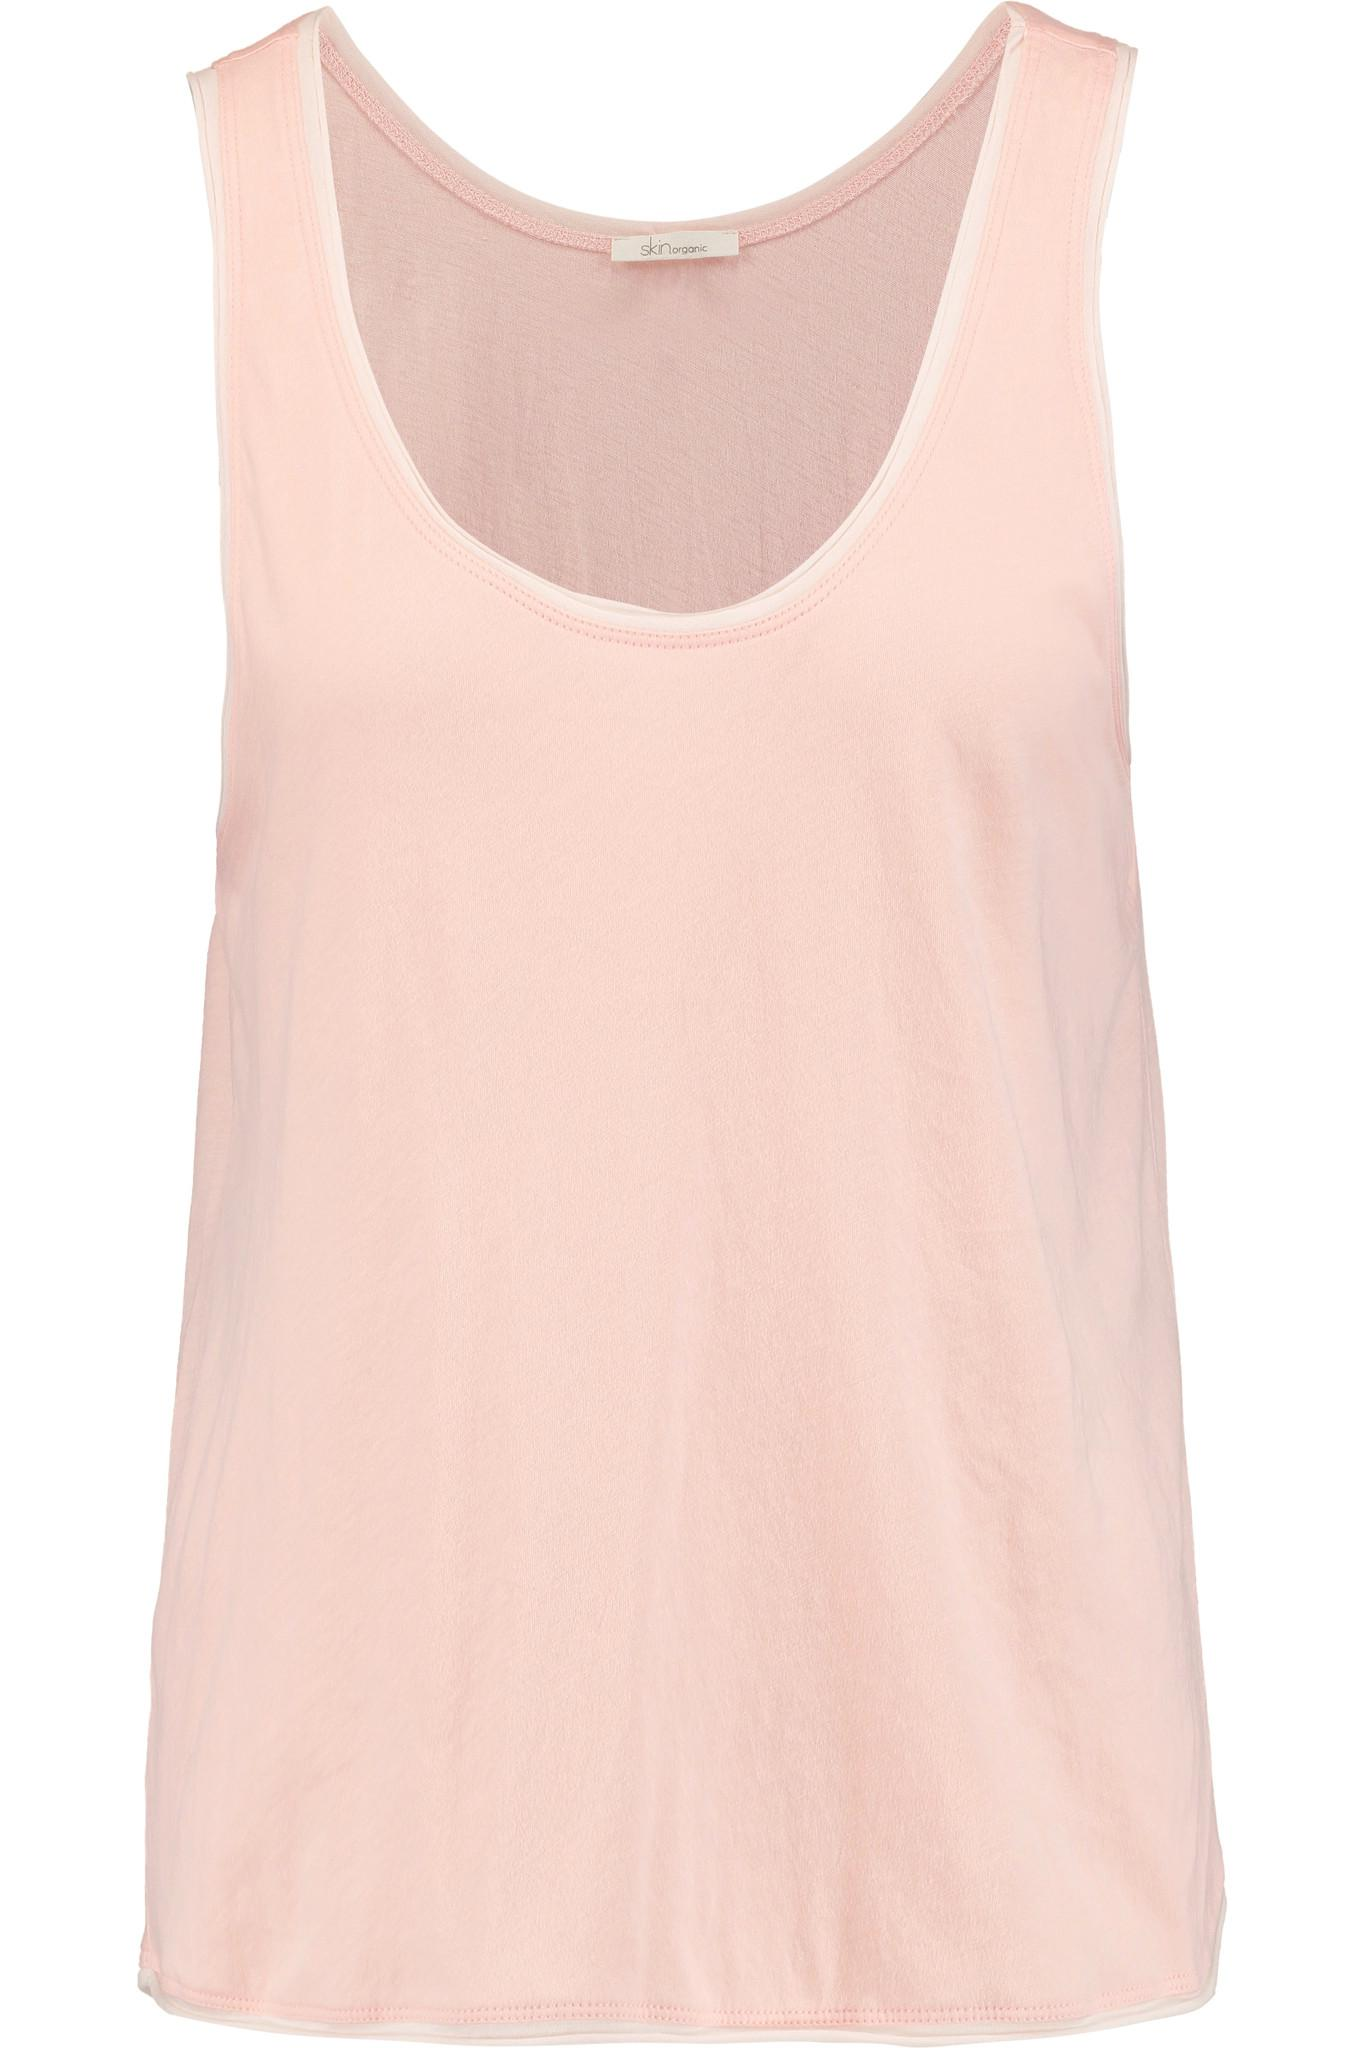 Sale Genuine Skin Woman Pima Cotton-jersey Top Pastel Pink Size S Skin Outlet Perfect Pre Order Cheap Online Buy Cheap Original Tuy505kGb